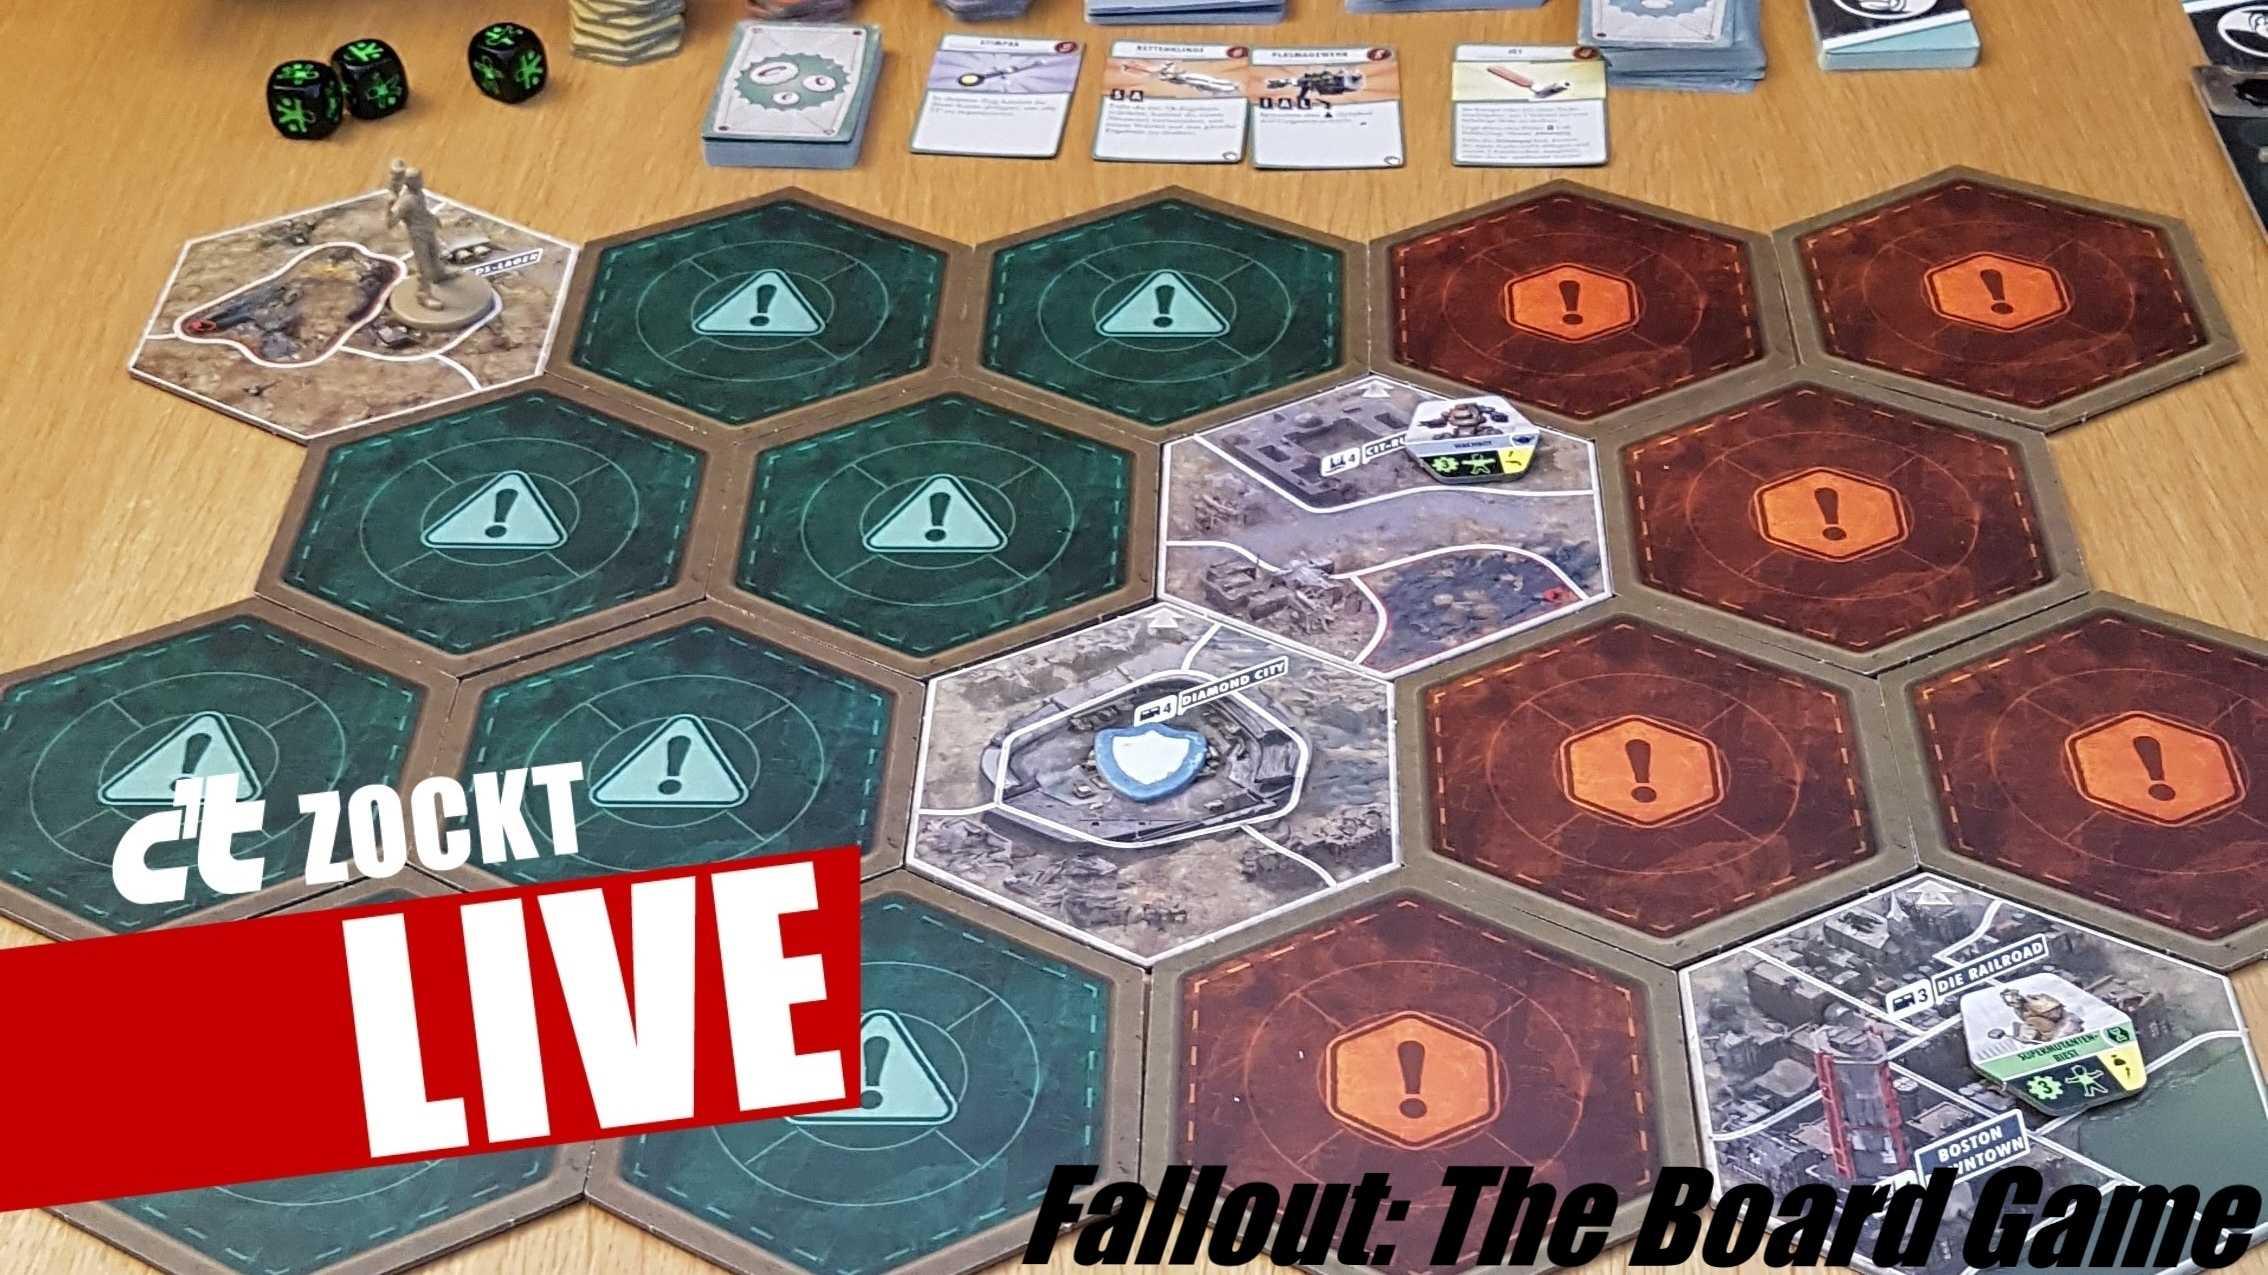 c't zockt LIVE Fallout: The Boardgame - Mit Würfeln im Wasteland